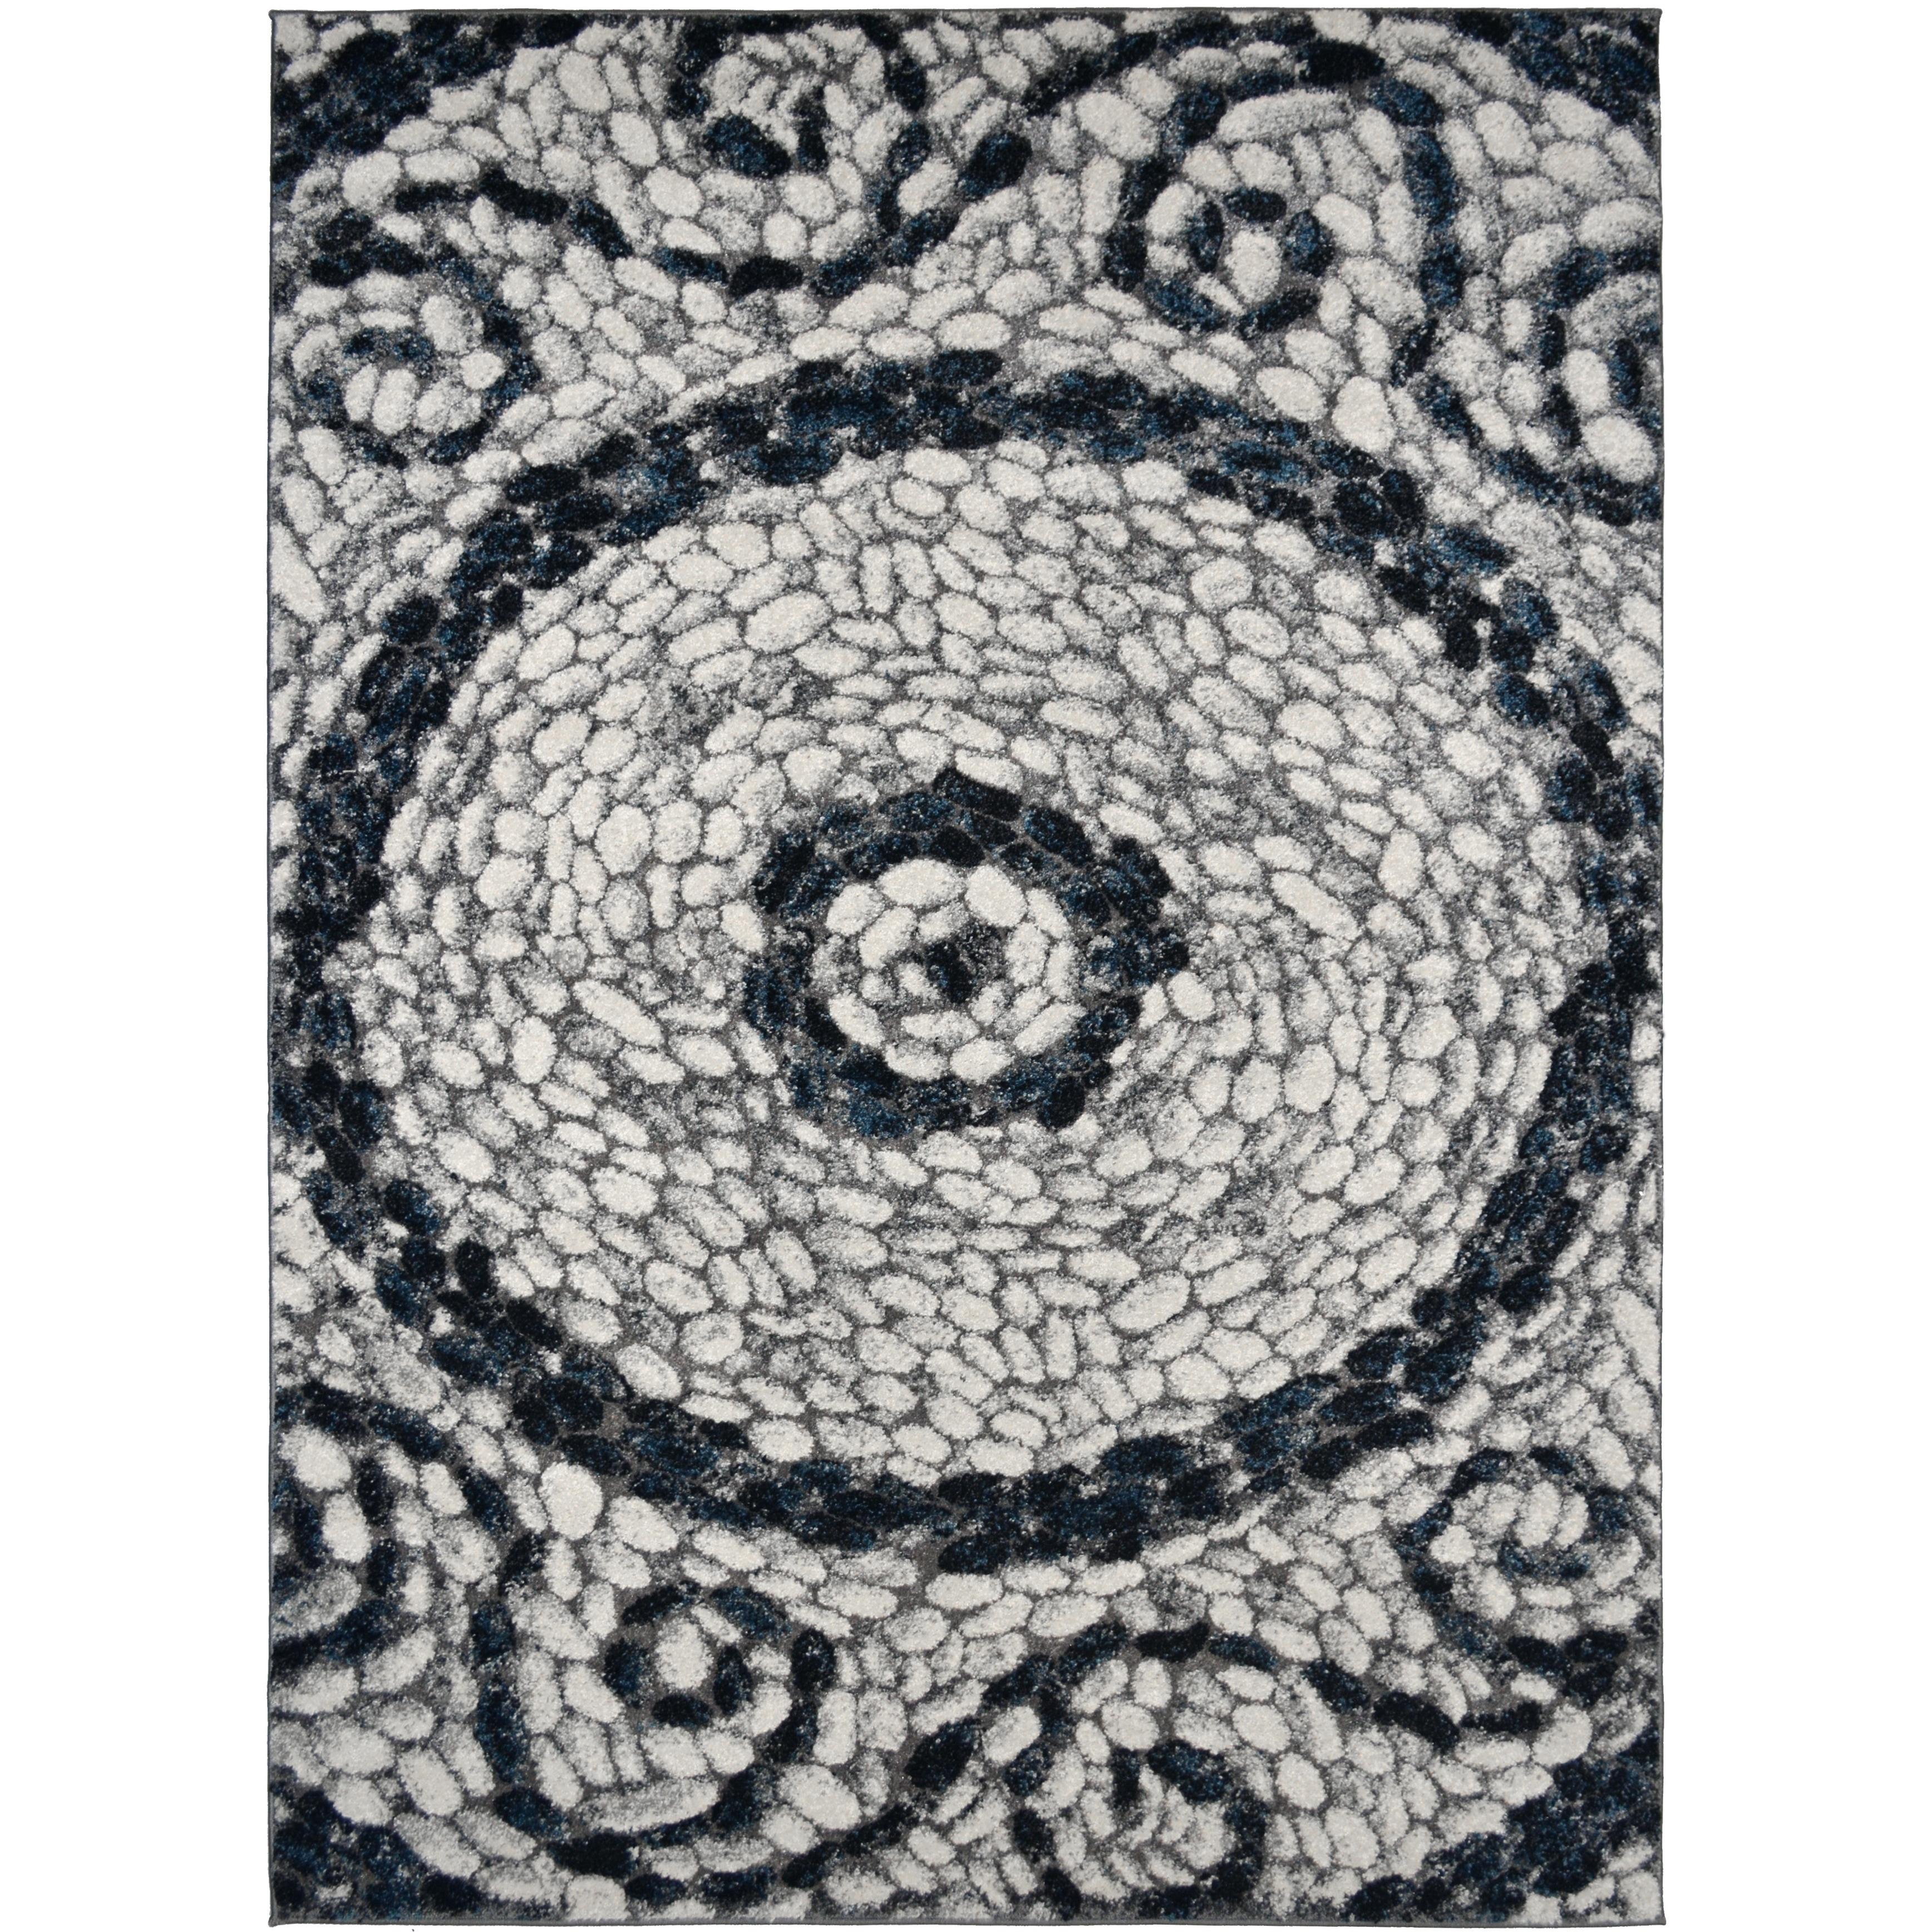 Porch Den Jarrell Cream And Grey Cobblestone Area Rug Overstock 26444621